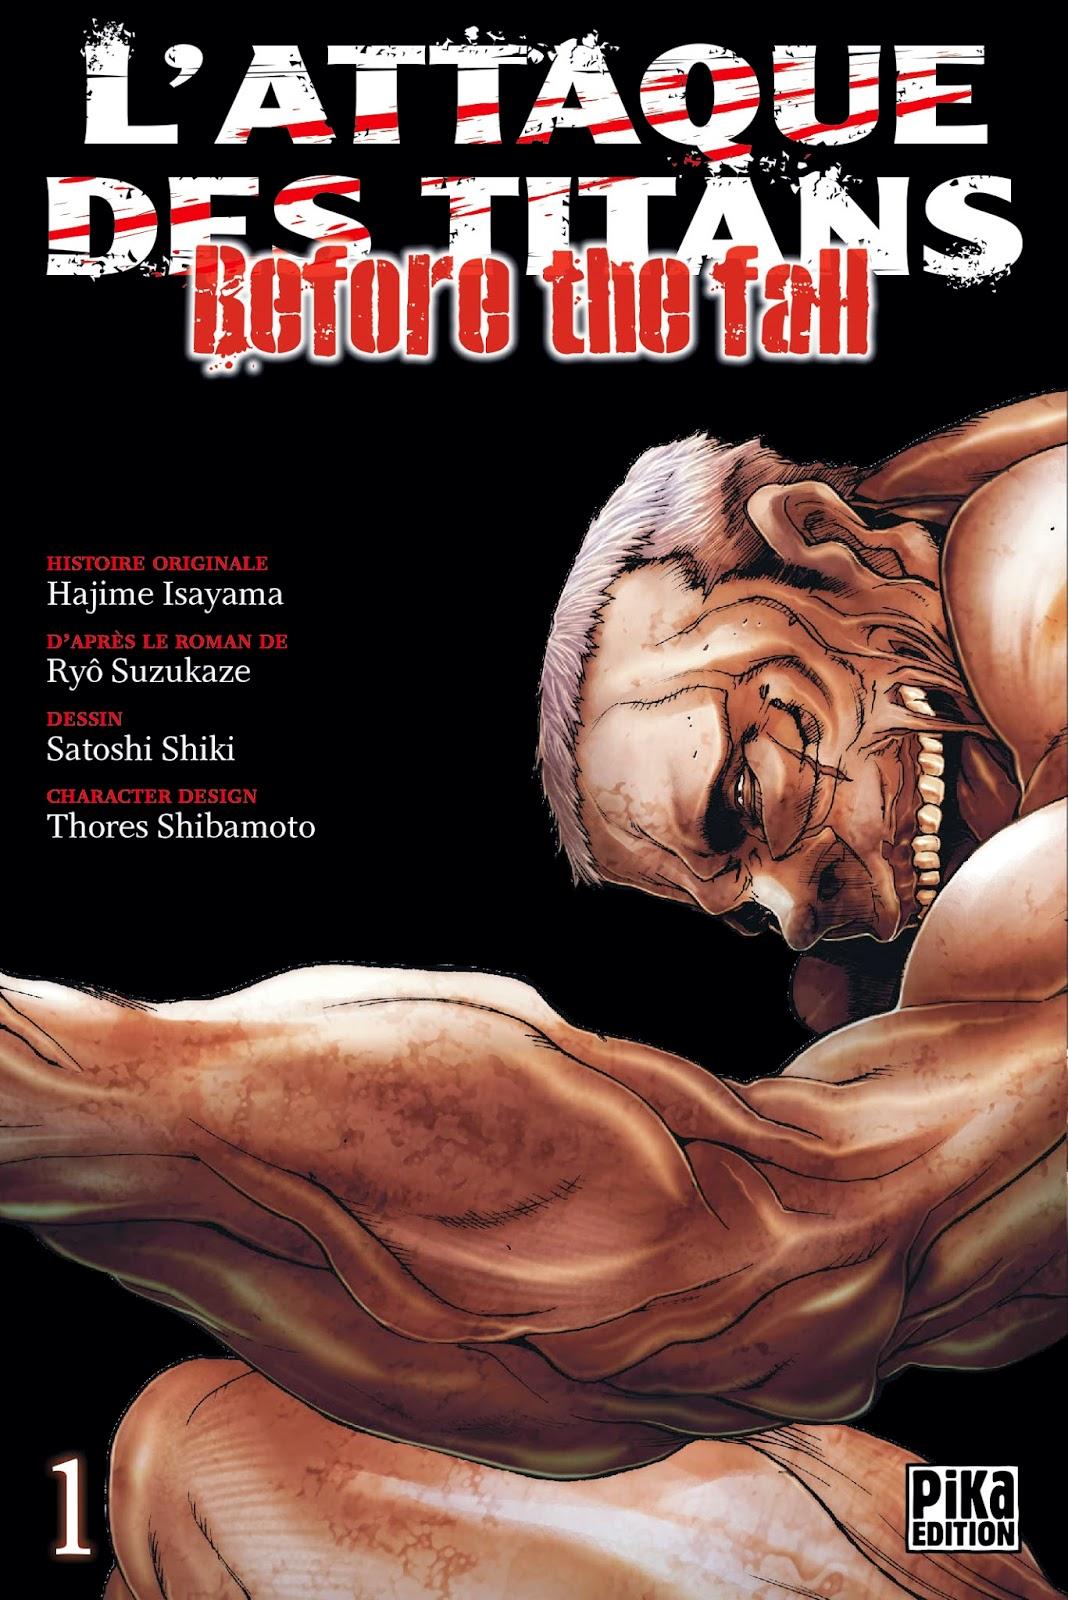 L'Attaque des Titans - Before the Fall, Pika Edition, Manga, Actu Manga,